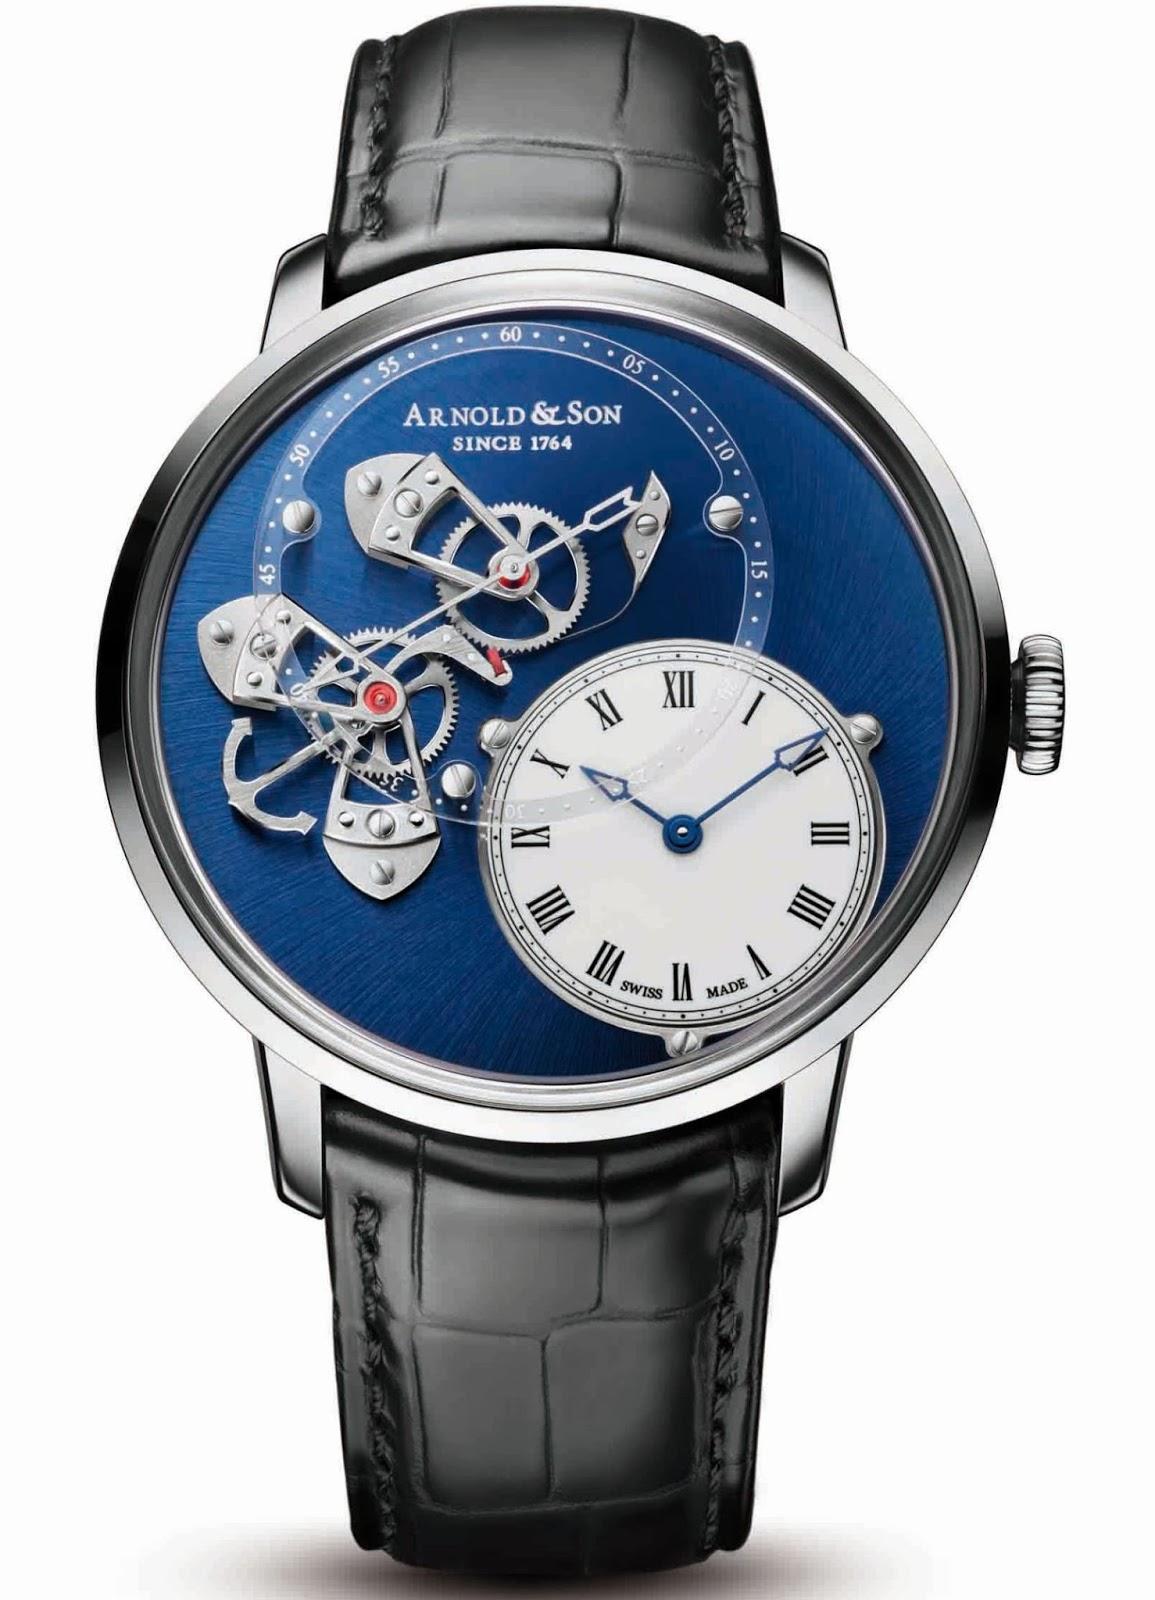 luxusni-hodinky-arnold-son-instrument-dstb